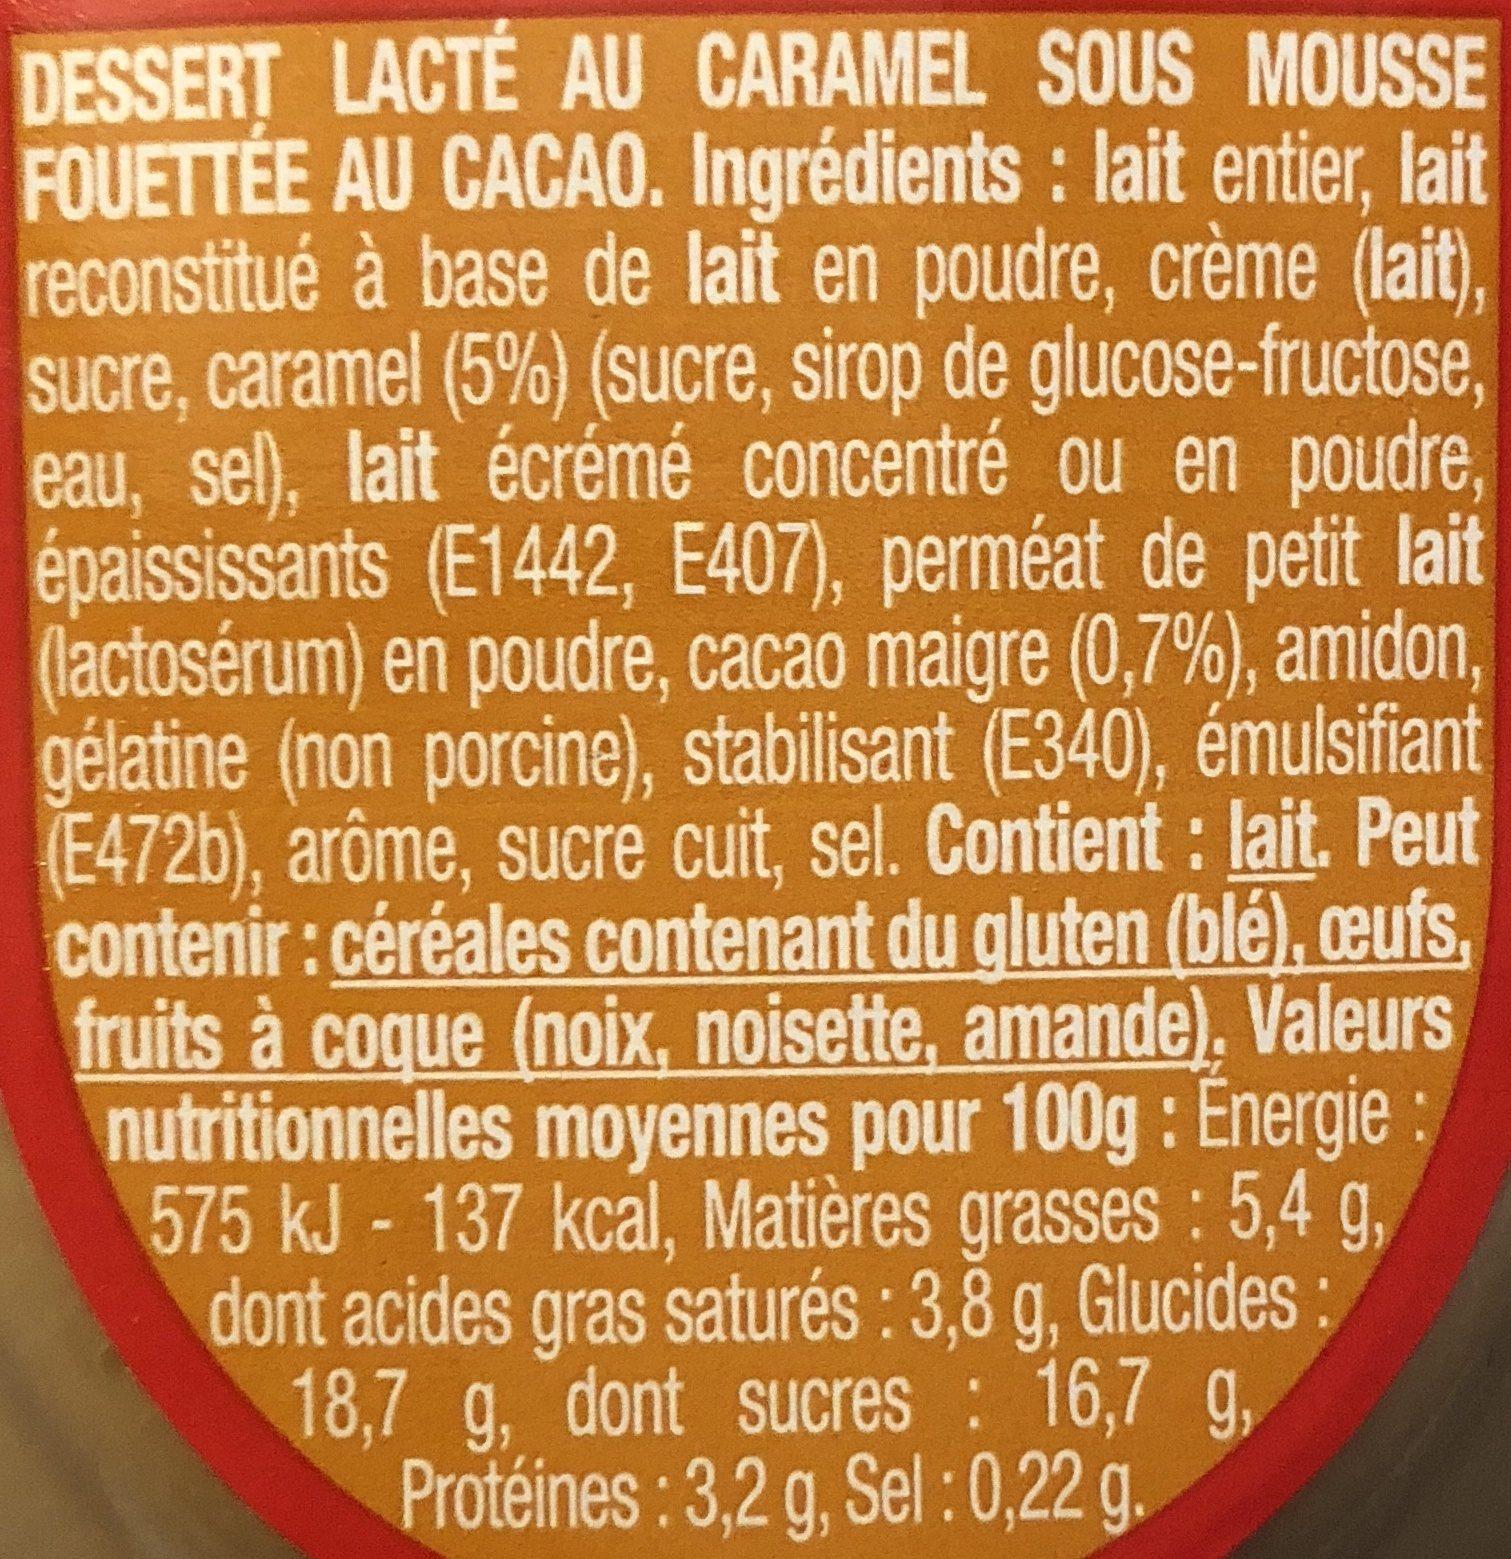 Liegeois caramel - Ingrédients - fr